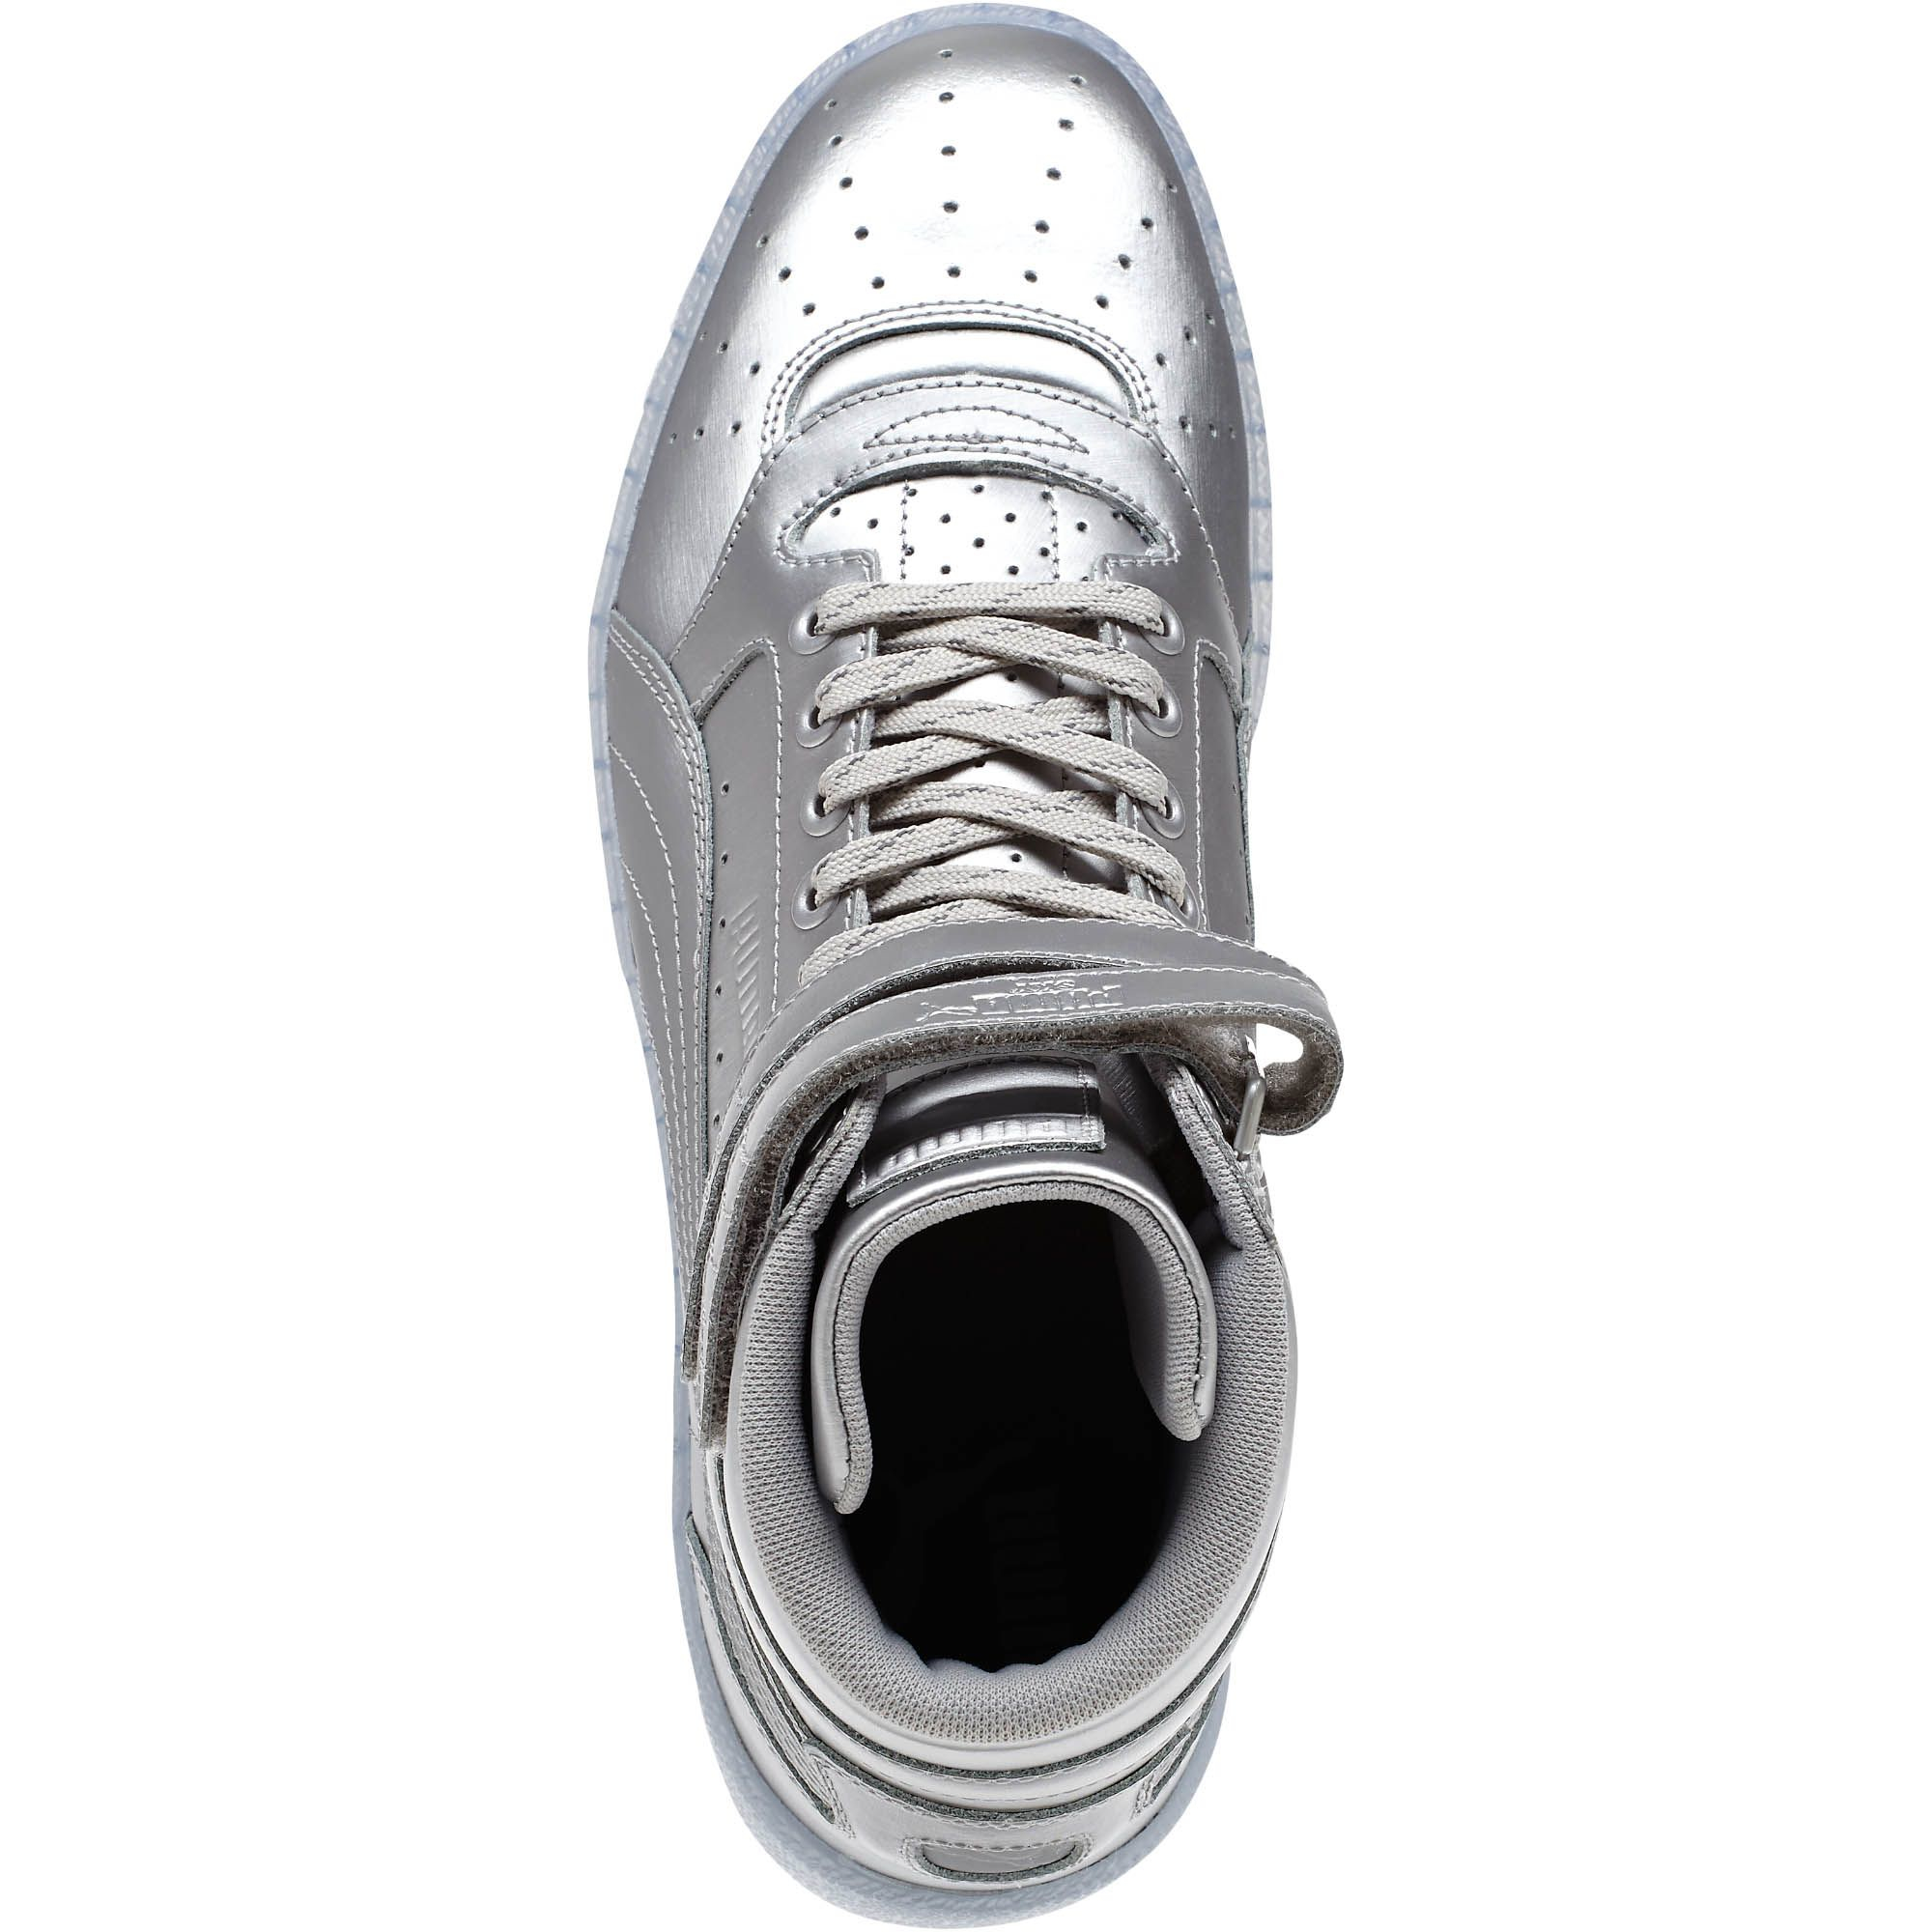 Lyst - PUMA Sky Ii Hi Platinum Men s Sneakers in Metallic for Men 47c1c30bd